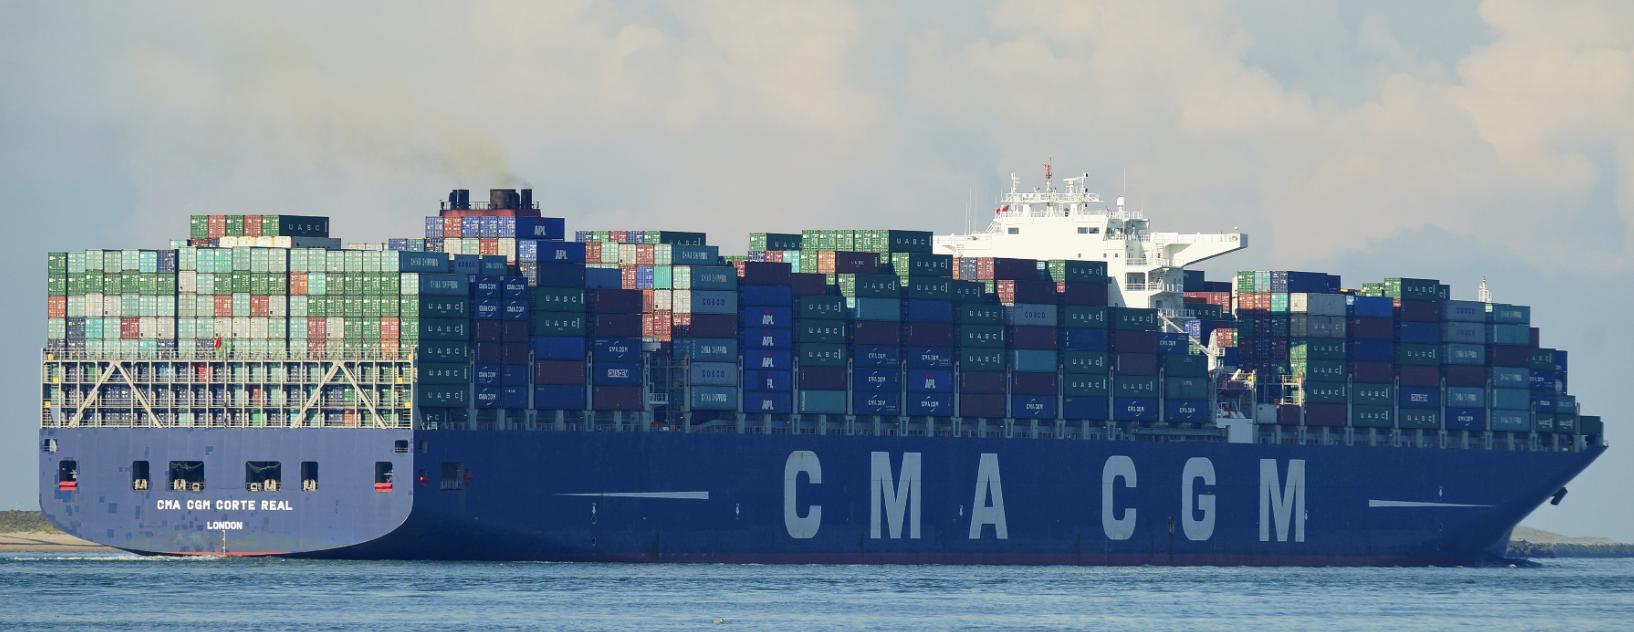 Egypte : CMA CGM va exploiter et gérer le futur terminal du port d'Alexandrie